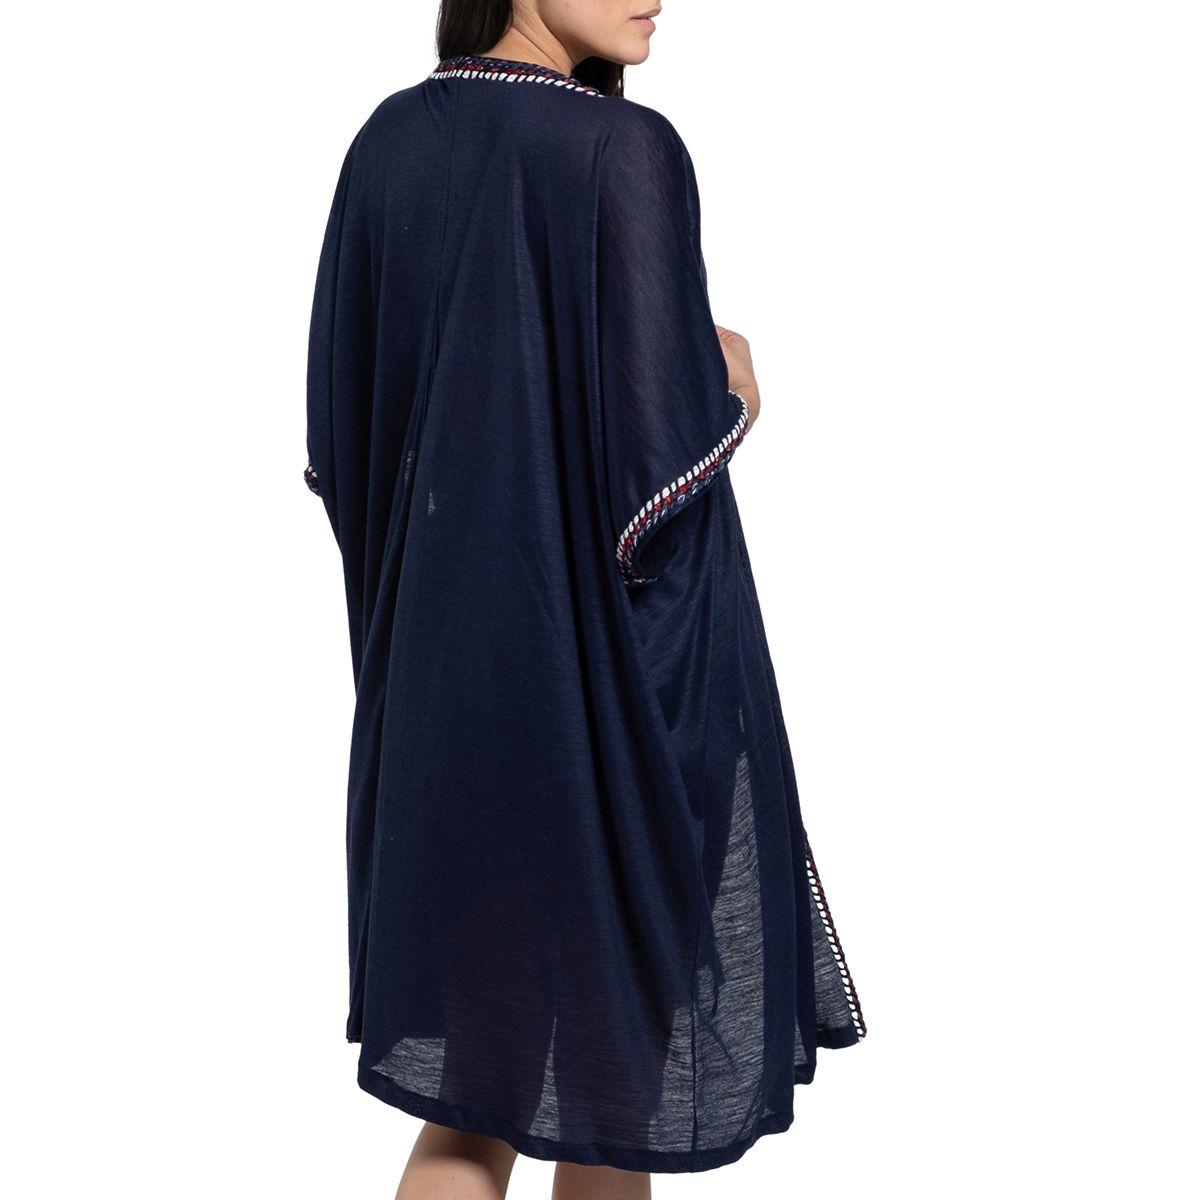 Dress - Laceverd / Navy